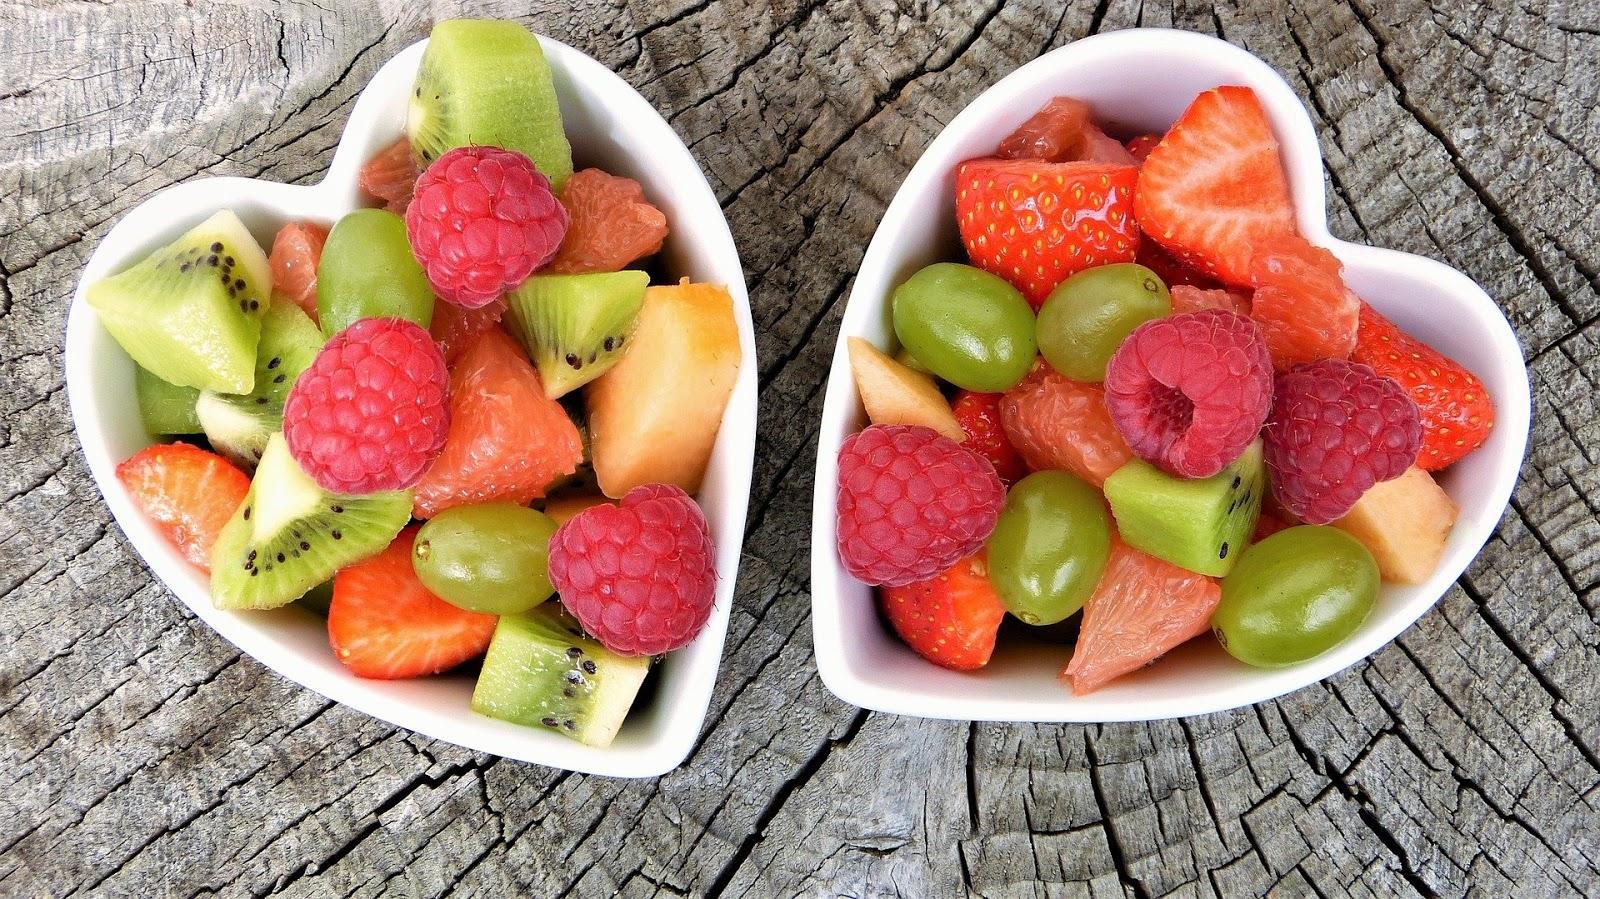 Fruit Fruits Fruit Salad Fresh Bio Healthy Heart Image